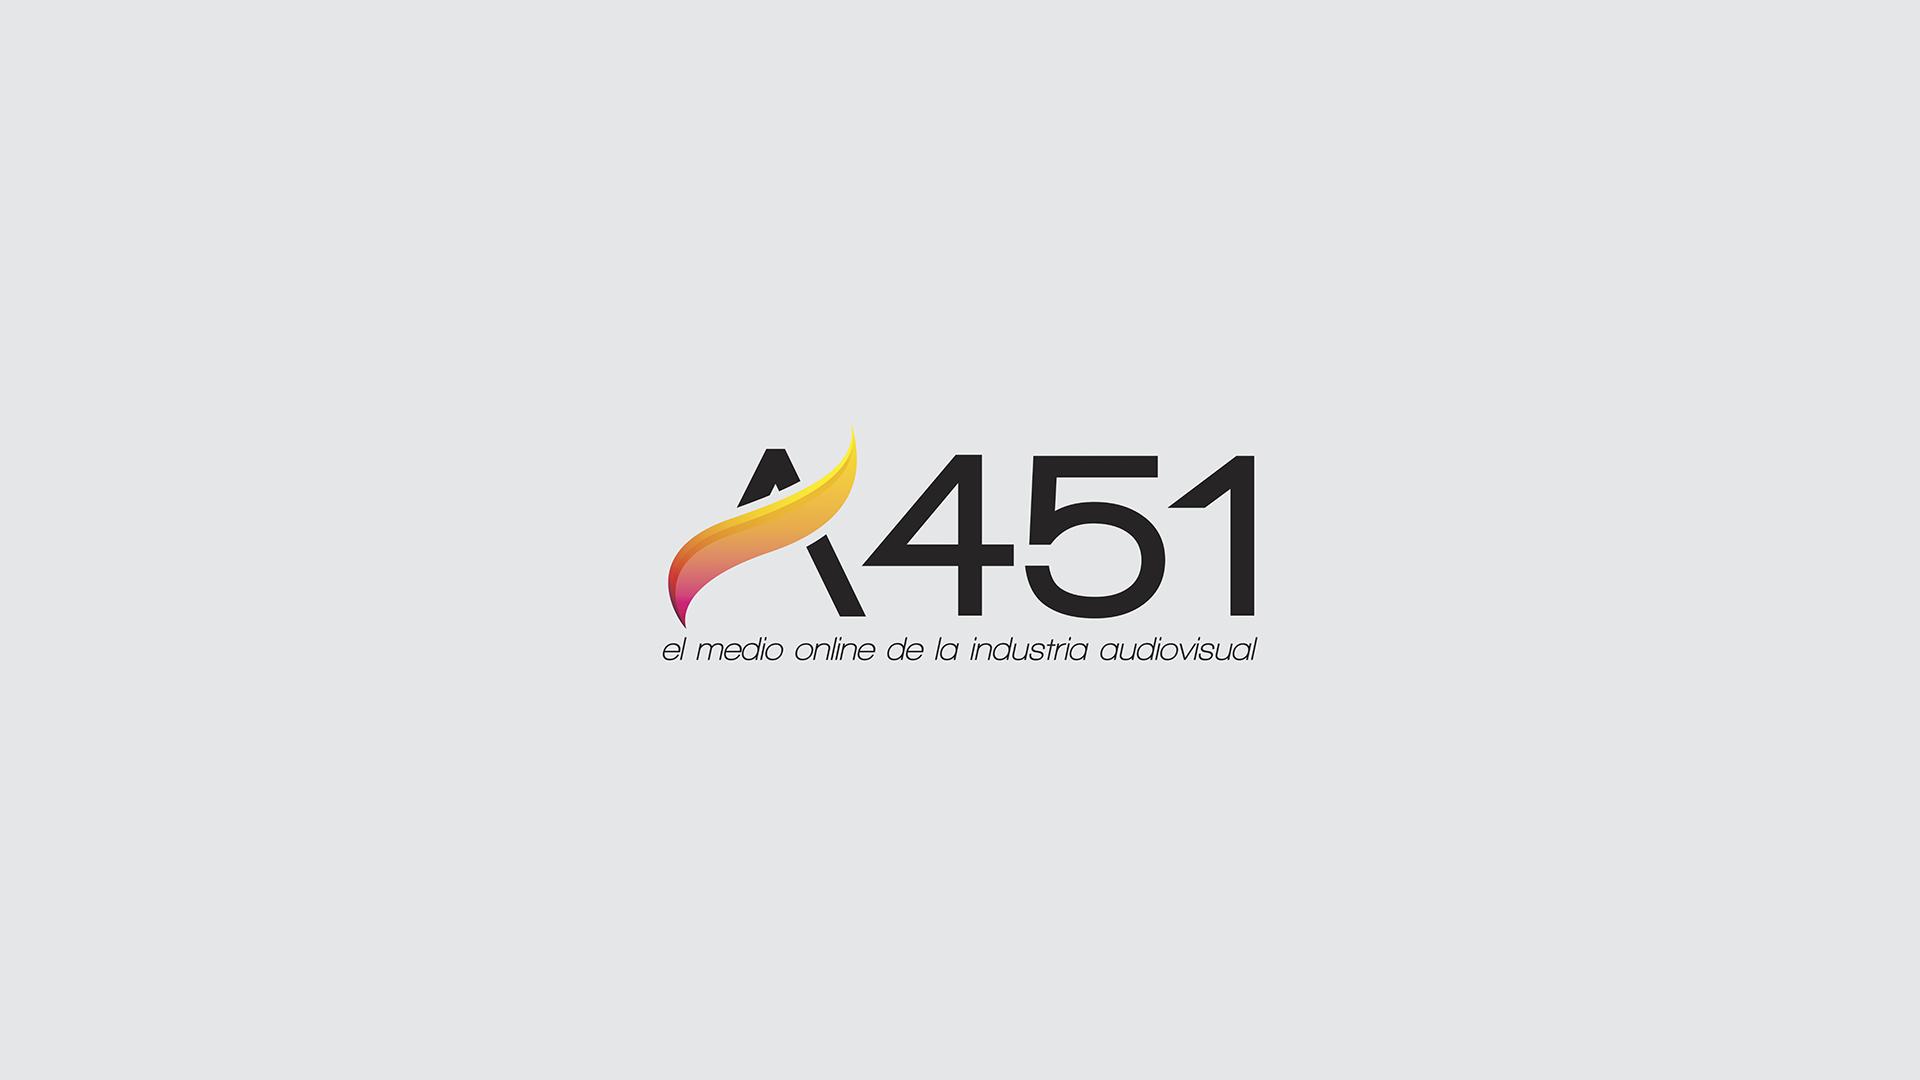 Audiovisual 451, web hecha por murciègalo en 2013